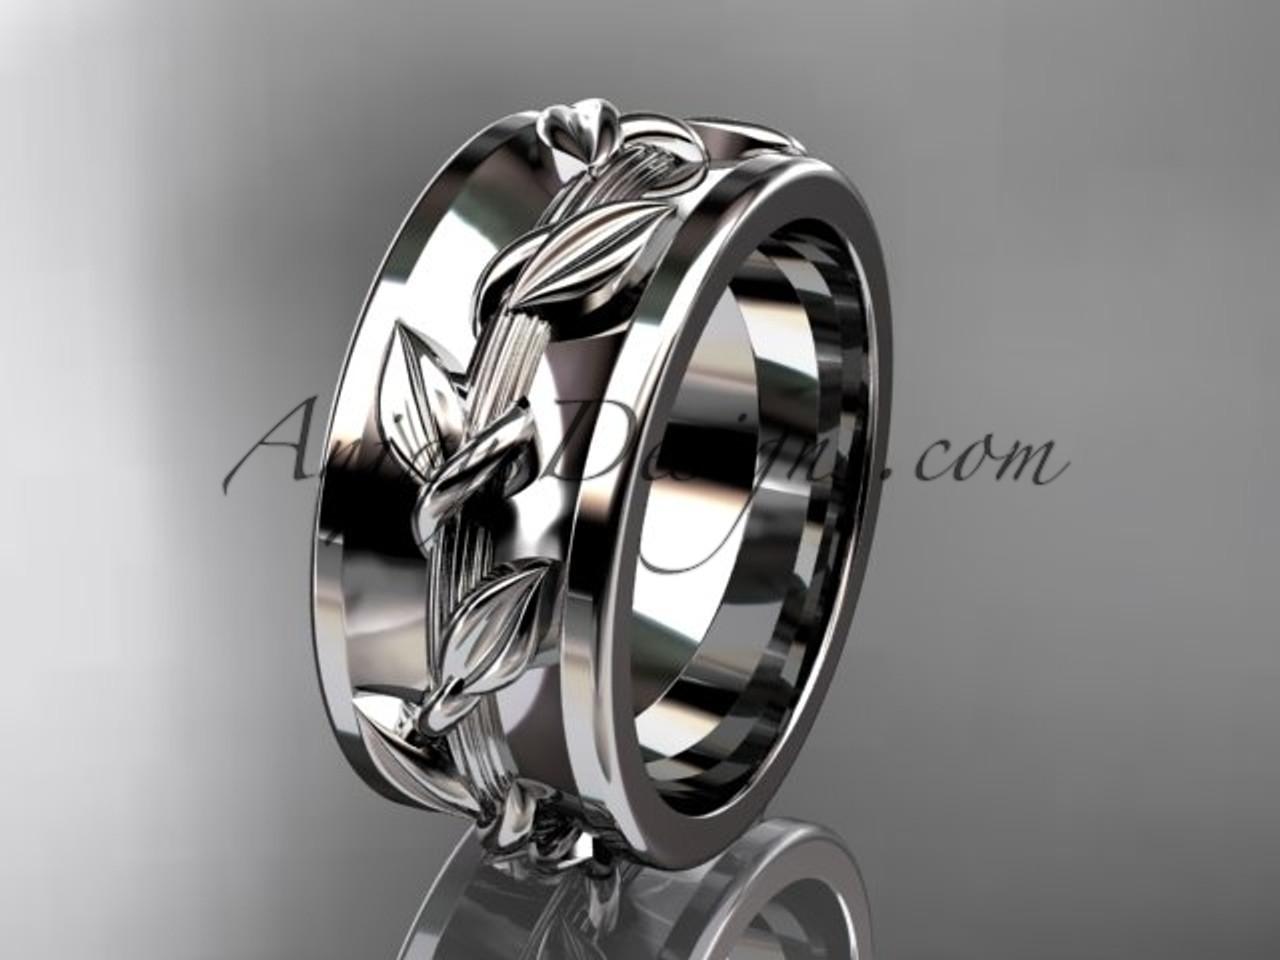 14kt White Gold Engagement Ring Wedding Band Adlr417g